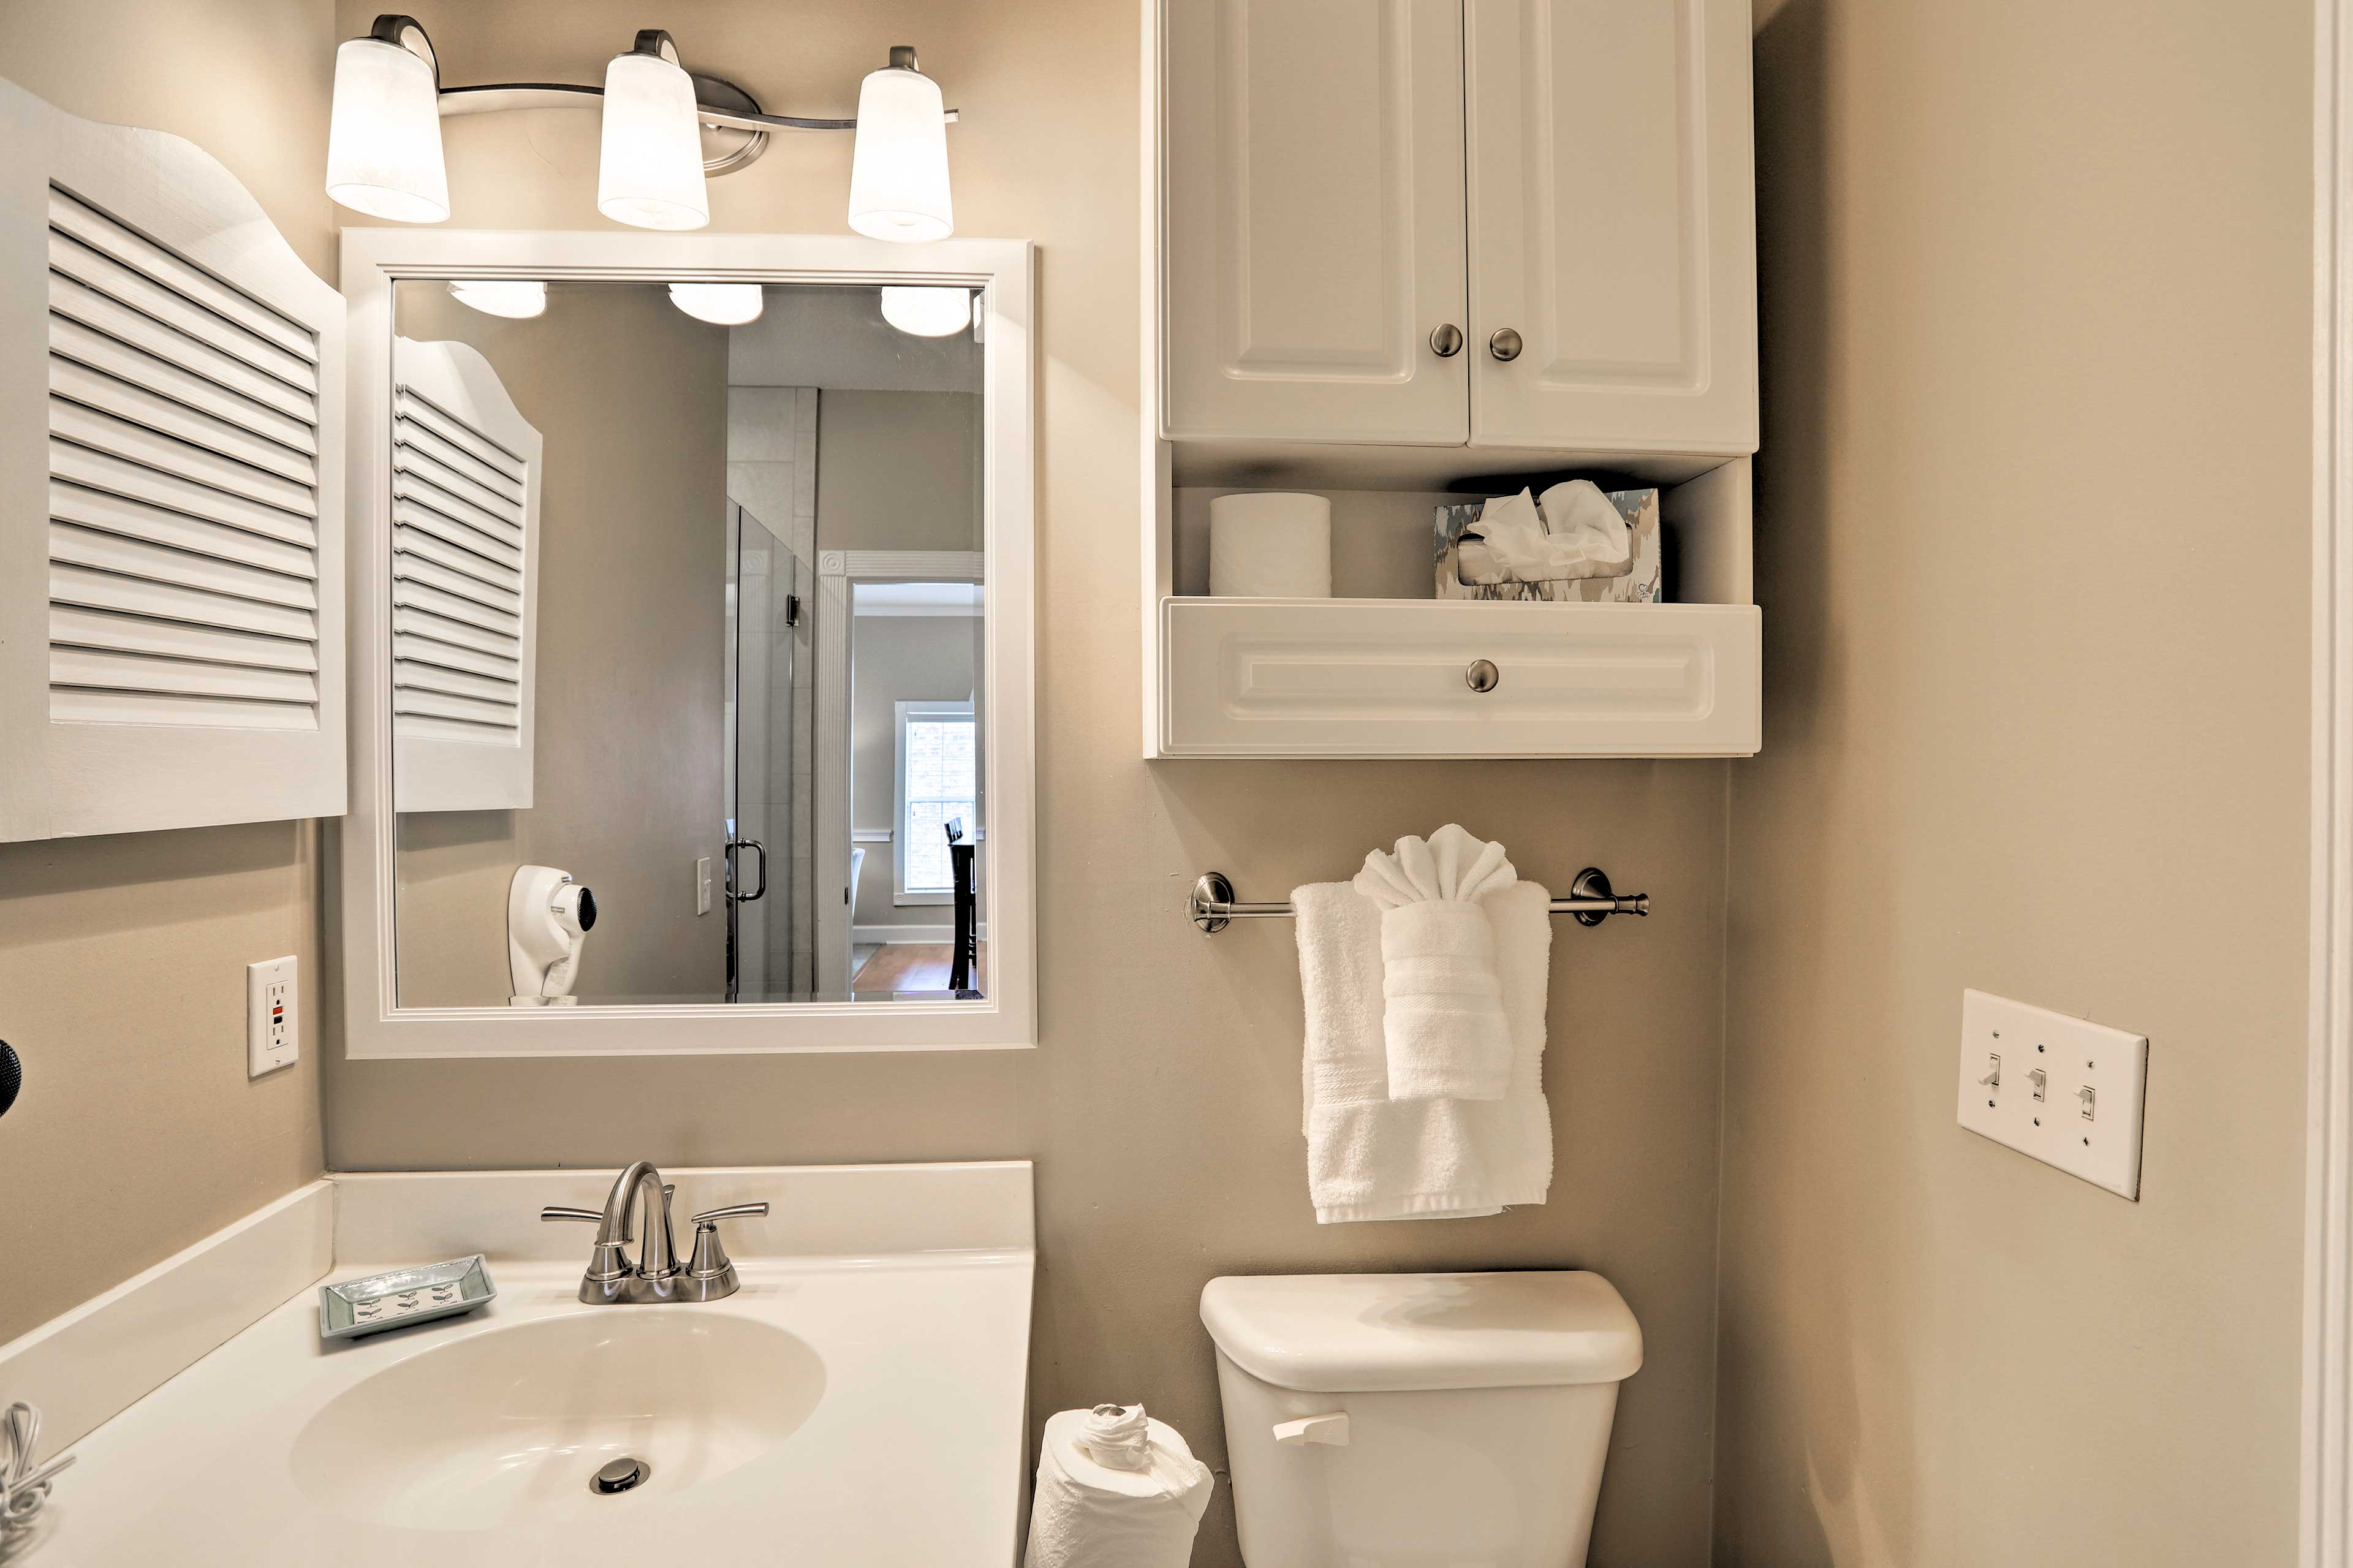 Full Bathroom | Towels Provided | Walk-In Shower